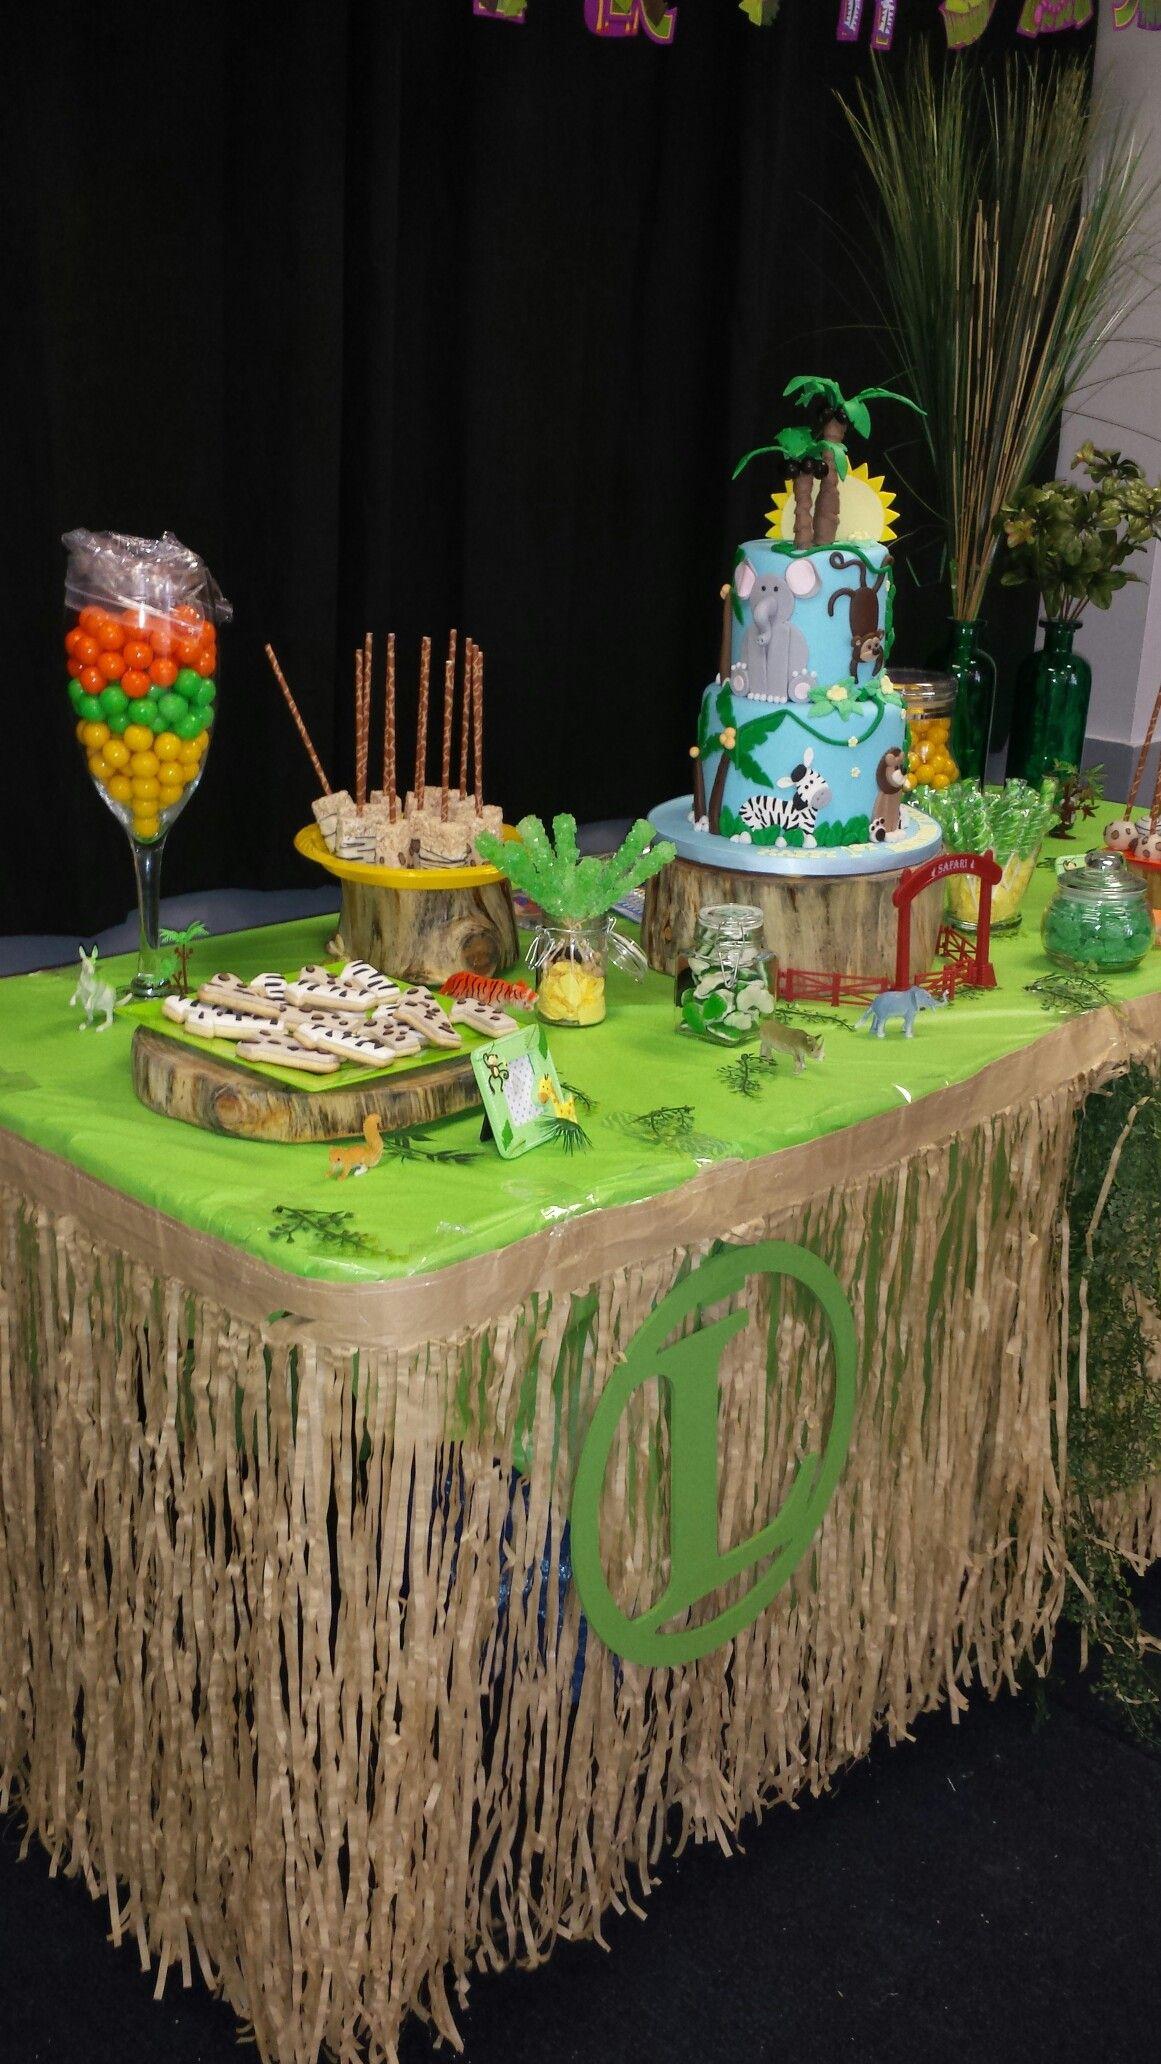 Safari Themed 1st Birthday Dessert Table Dessert Table Birthday Birthday Desserts Dessert Table